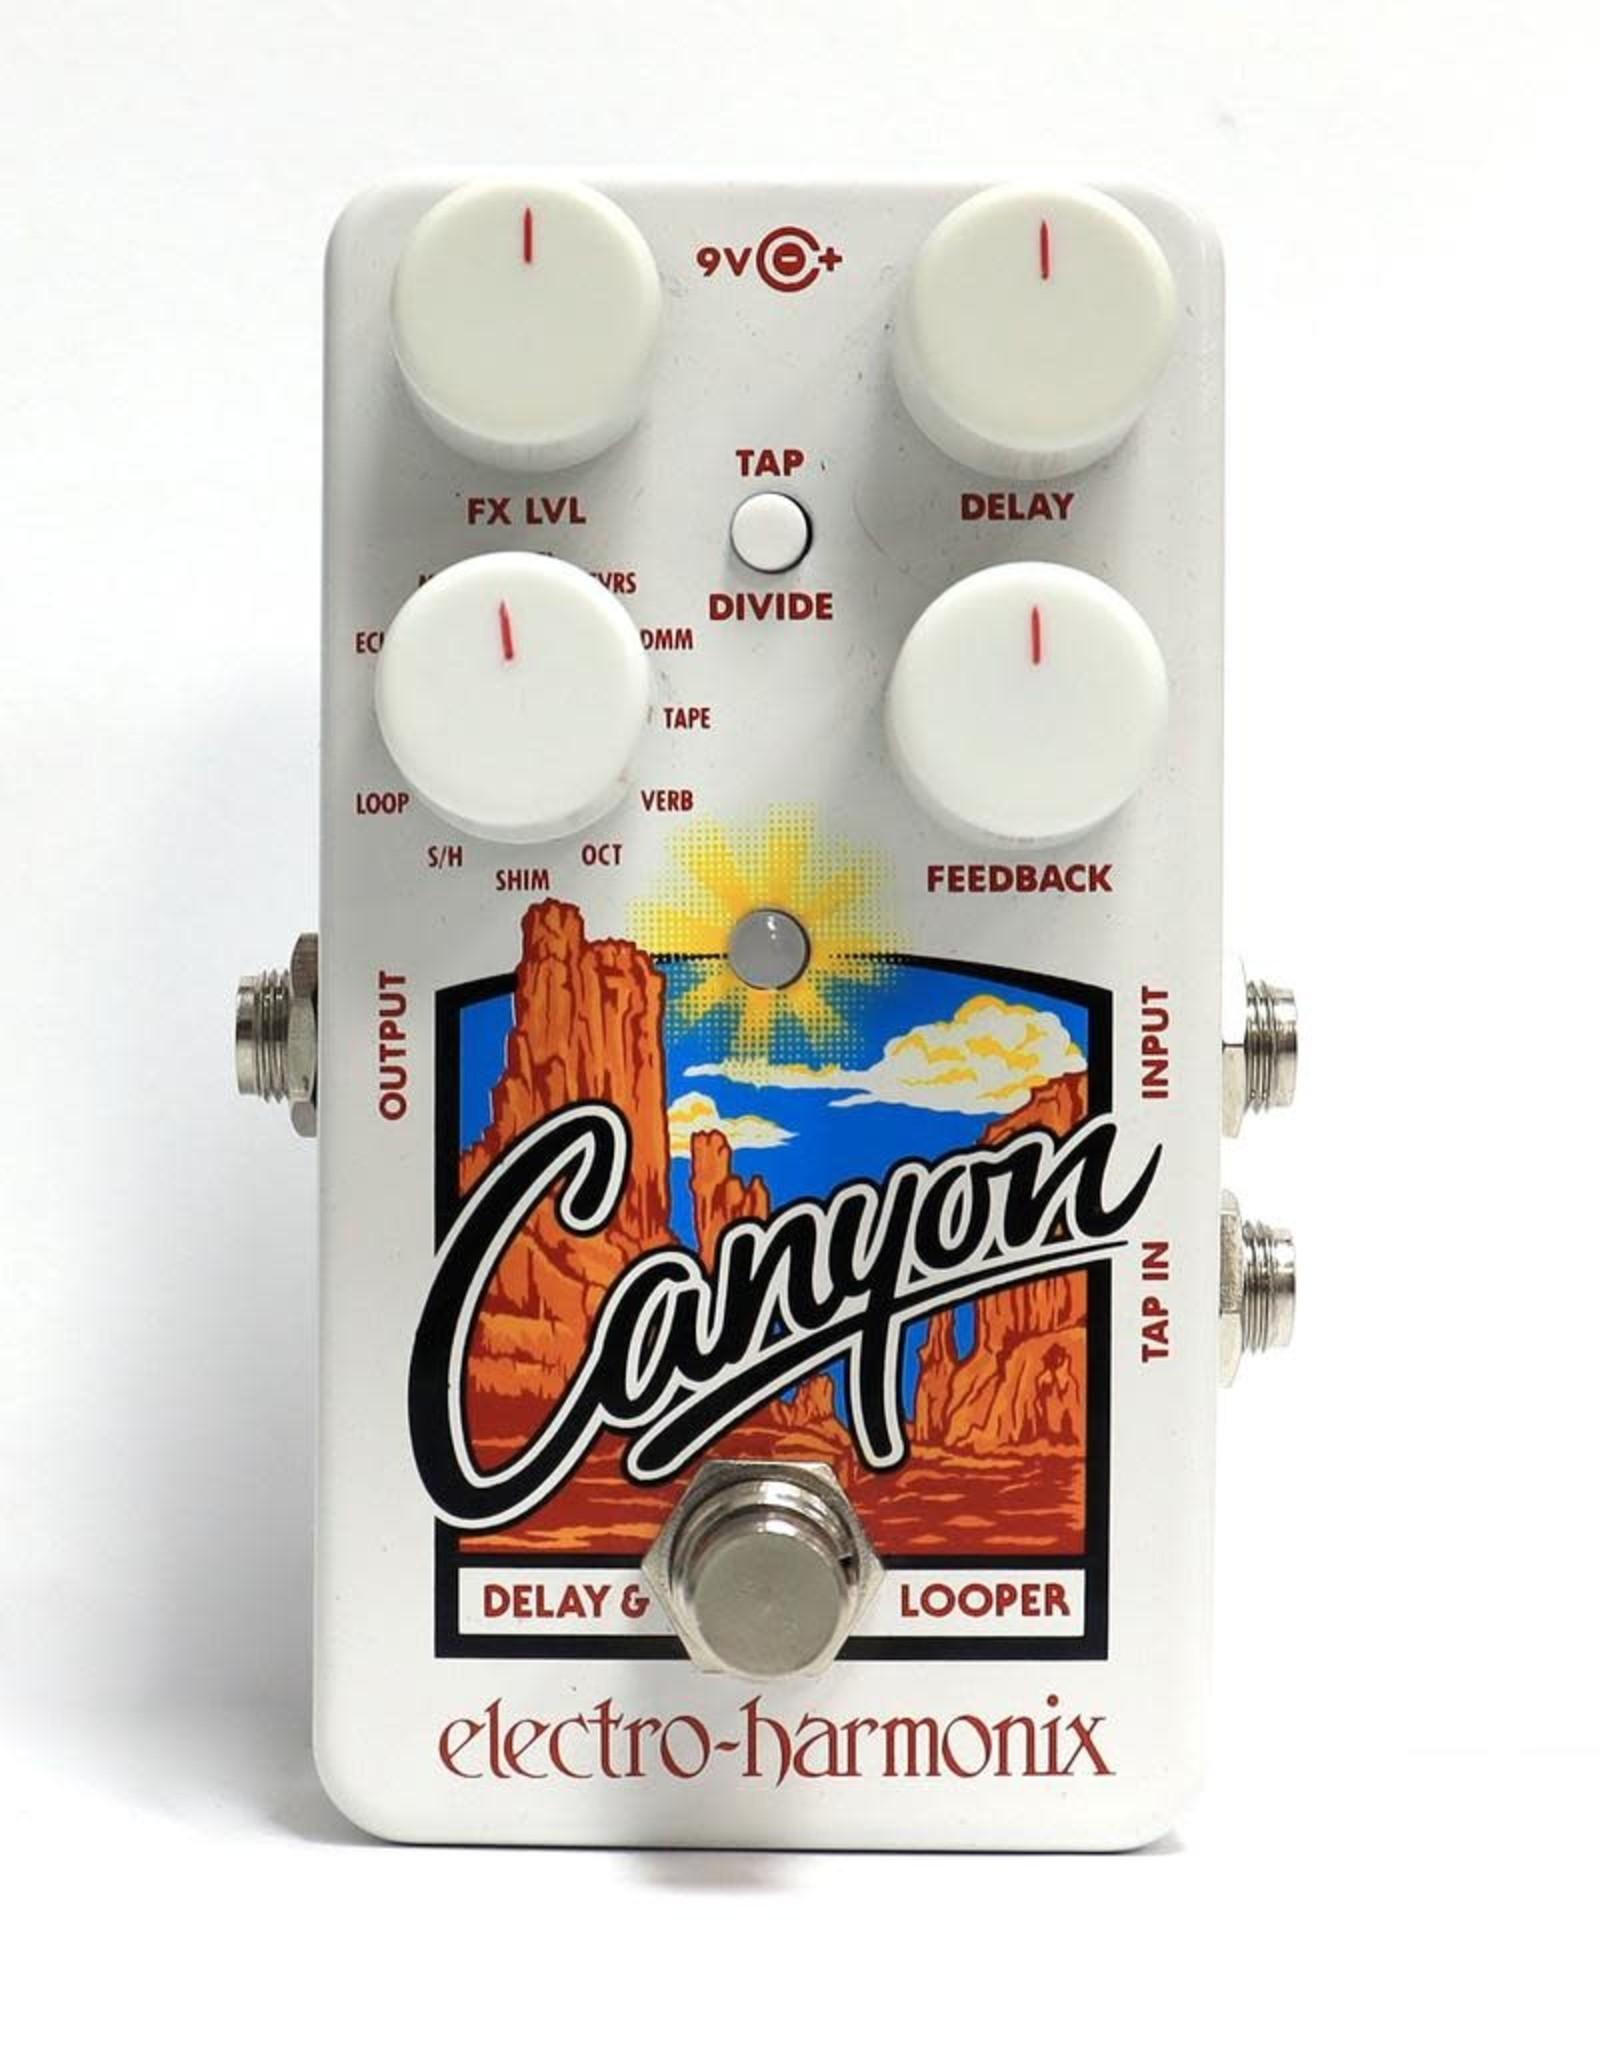 Electro-Harmonix Electro-Harmonix Canyon - Delay and Looper, 9.6DC-200 PSU included